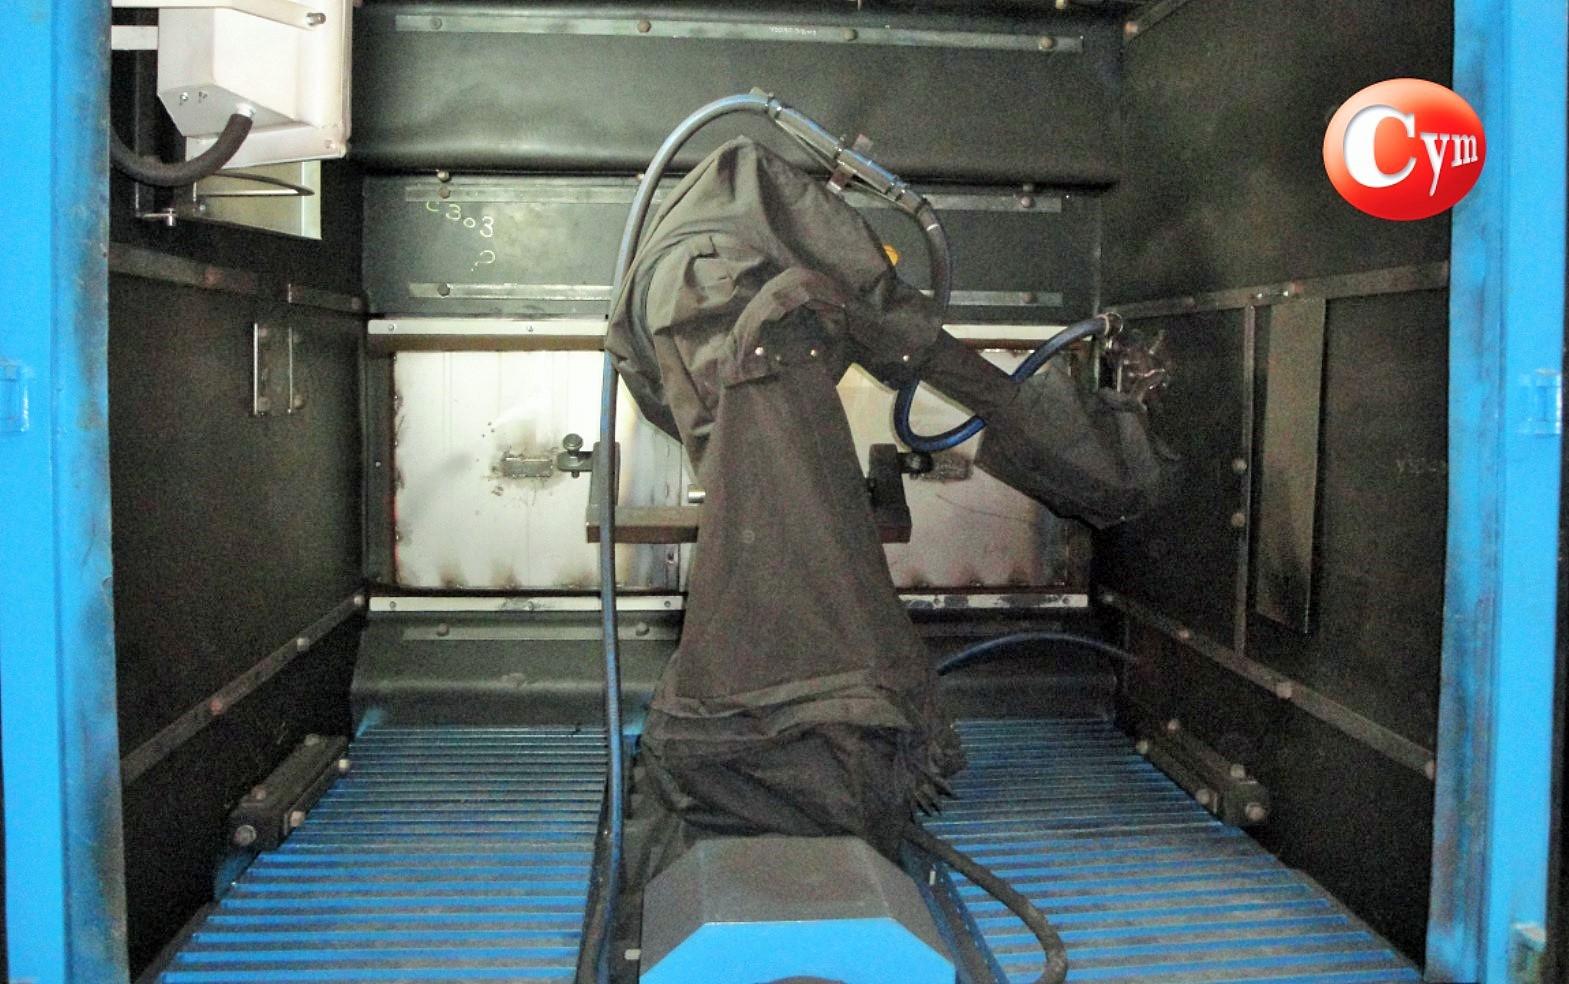 shot-peening-cnc-robot-para-trabajos-localizados-cym